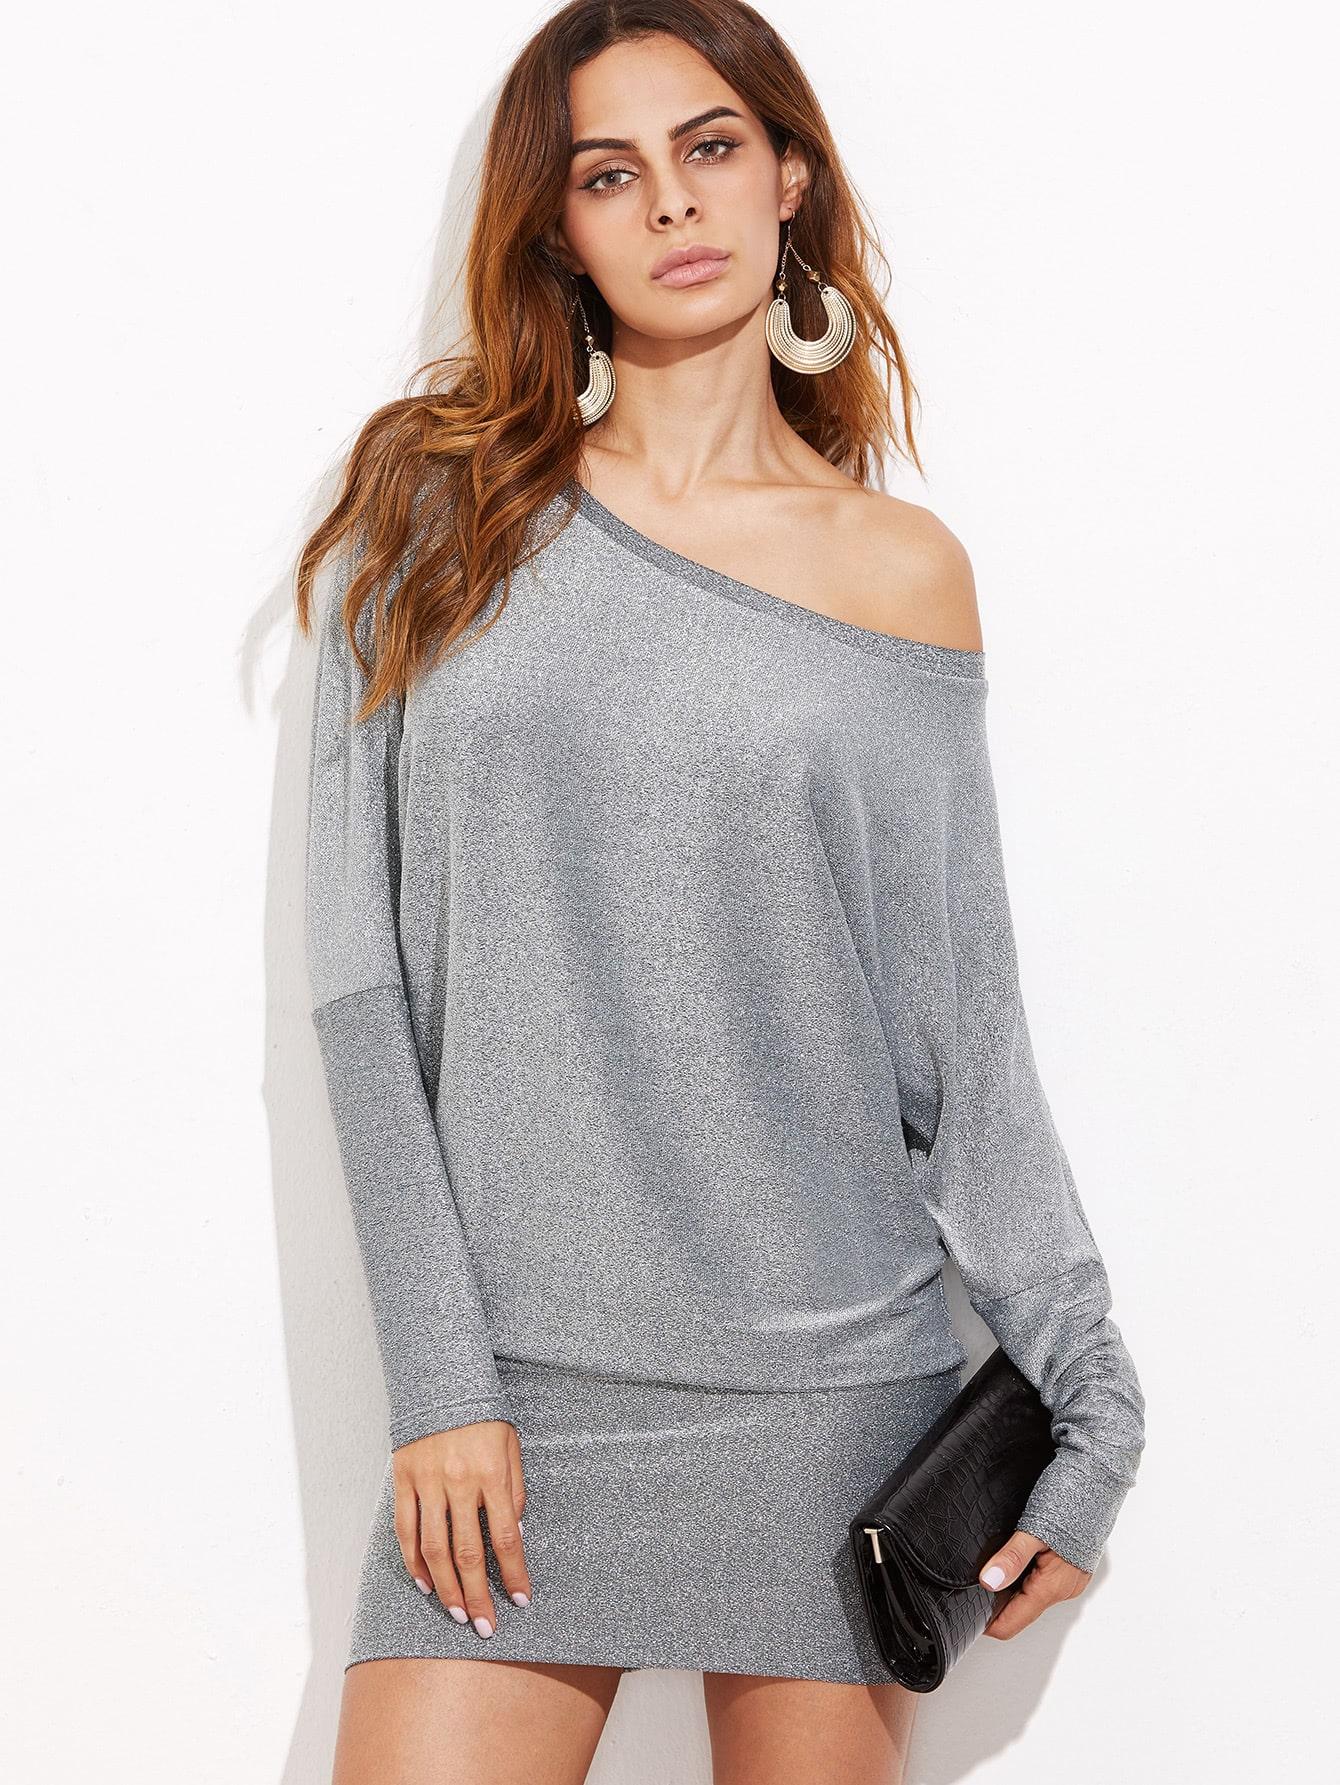 Silver Glitter Asymmetric Shoulder Banded Hem DressSilver Glitter Asymmetric Shoulder Banded Hem Dress<br><br>color: Grey<br>size: M,S,XS